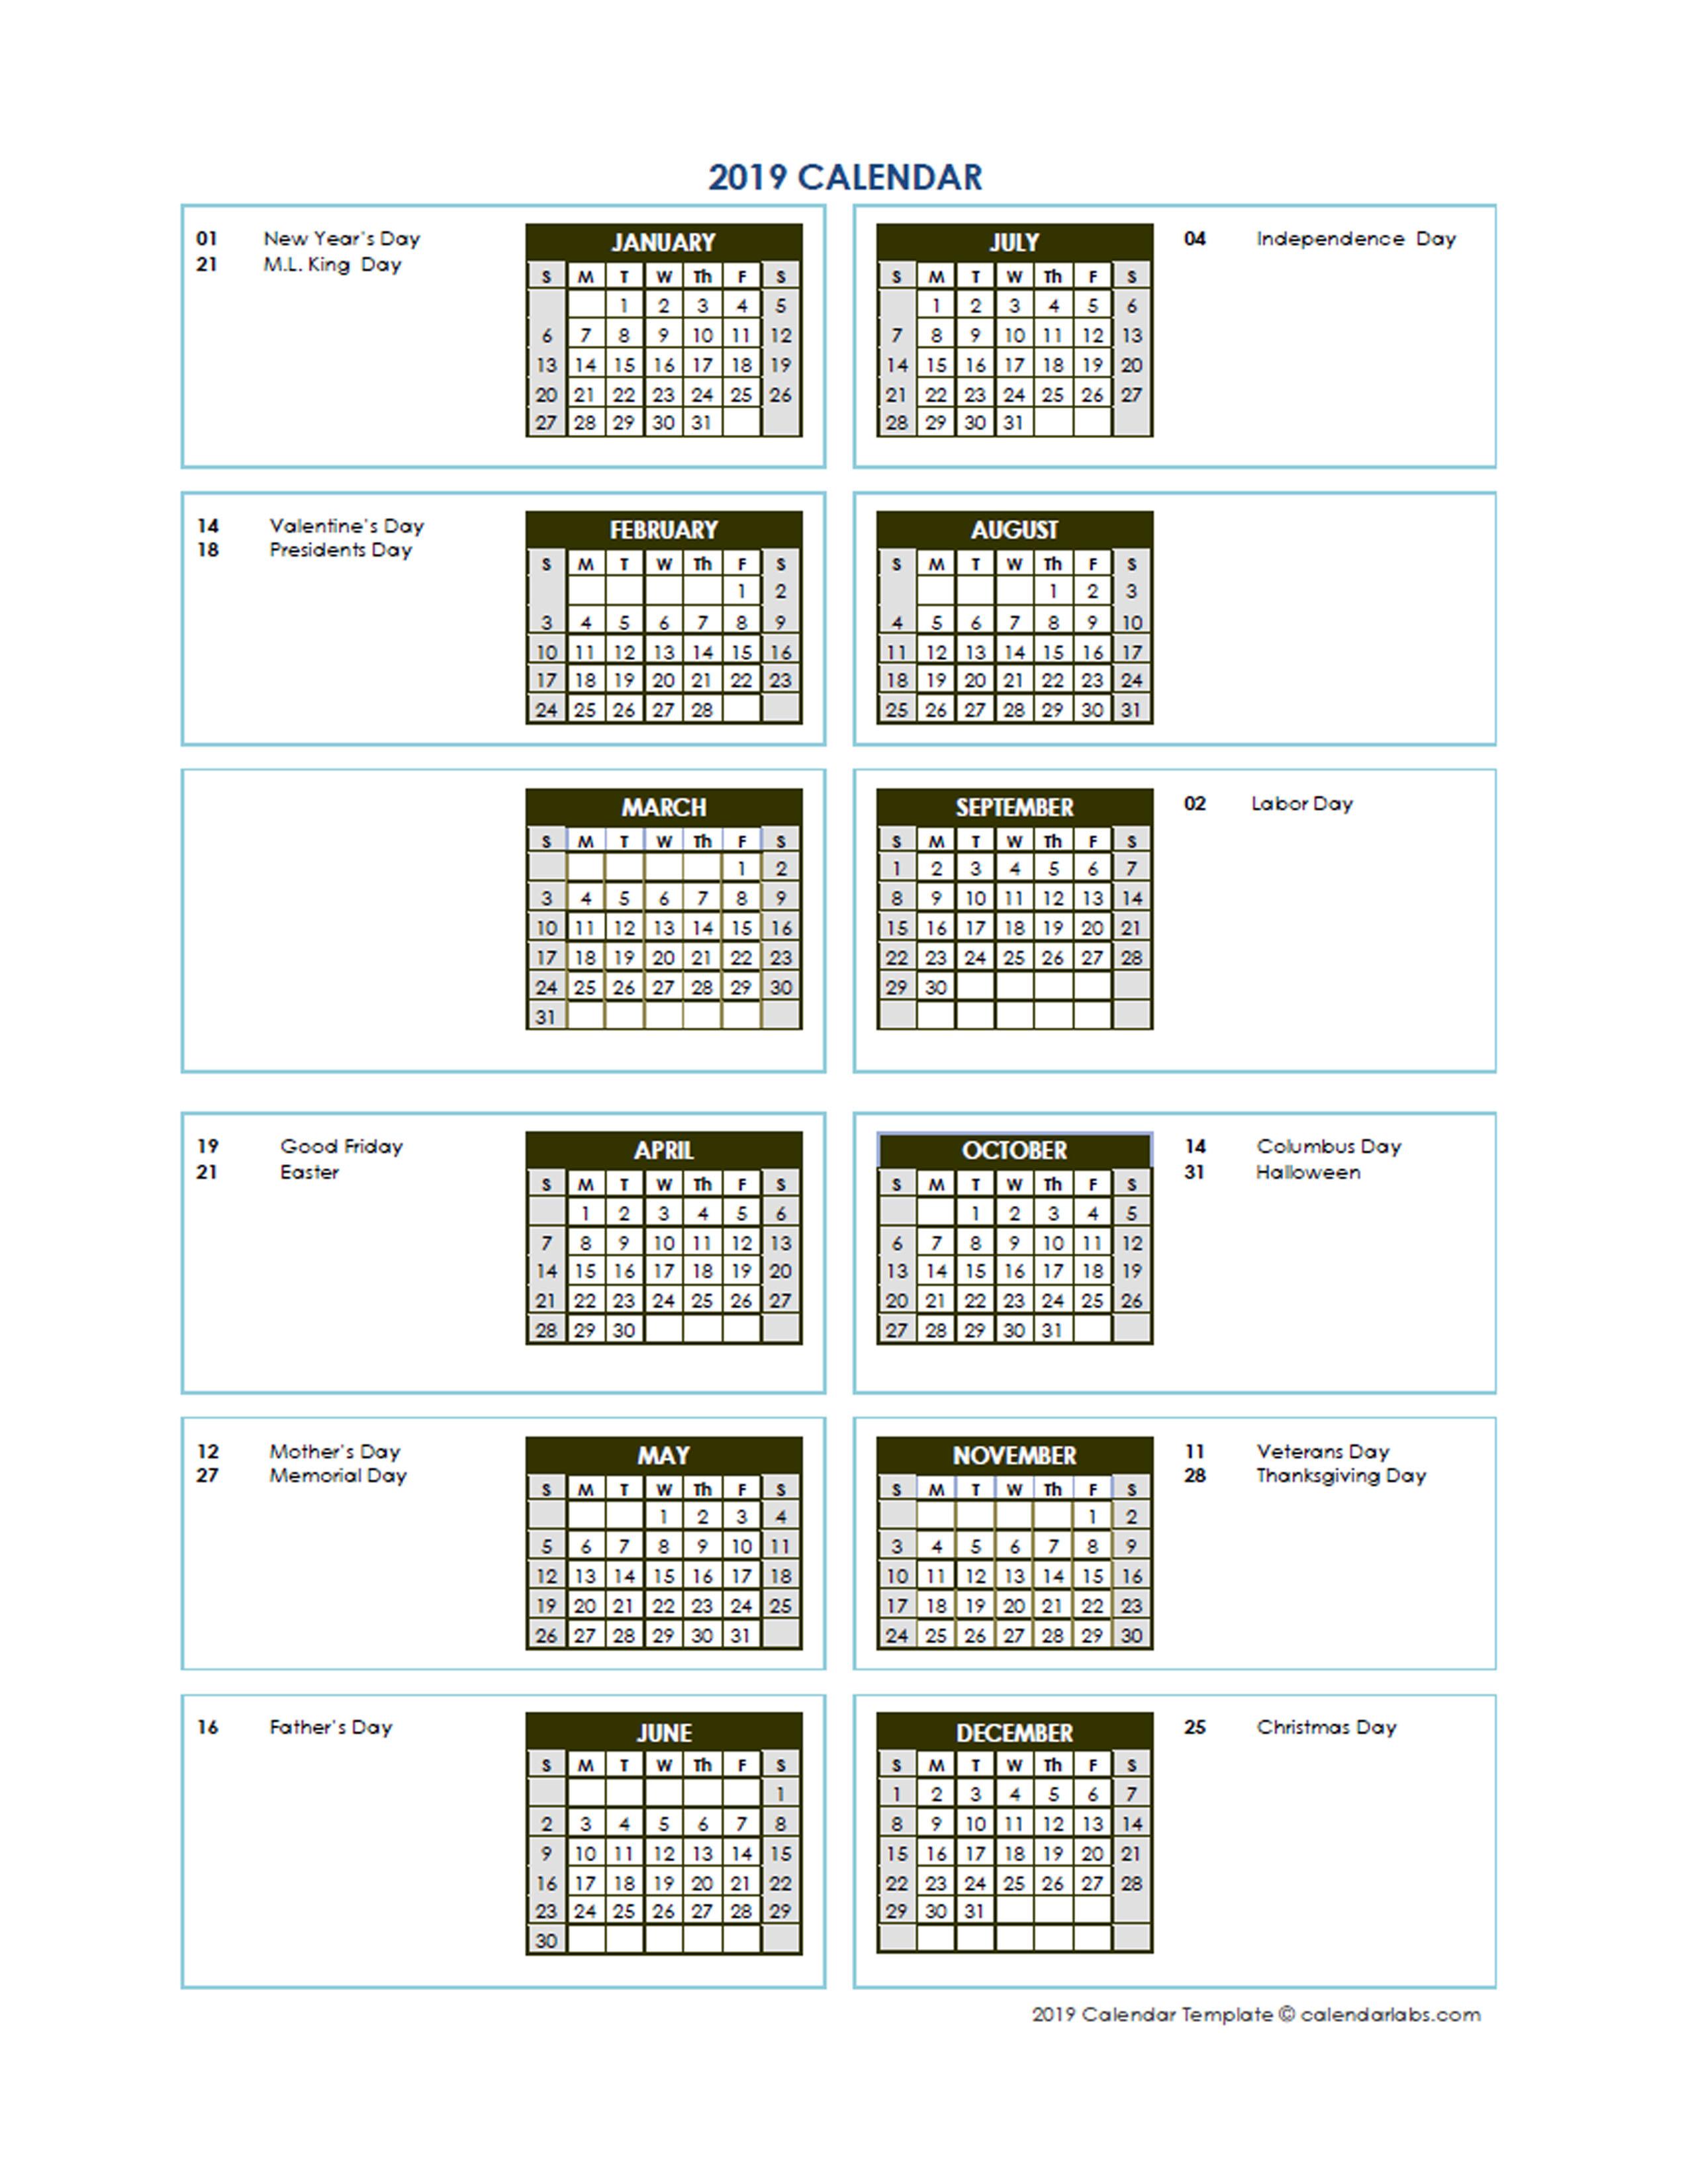 2019 annual calendar vertical template